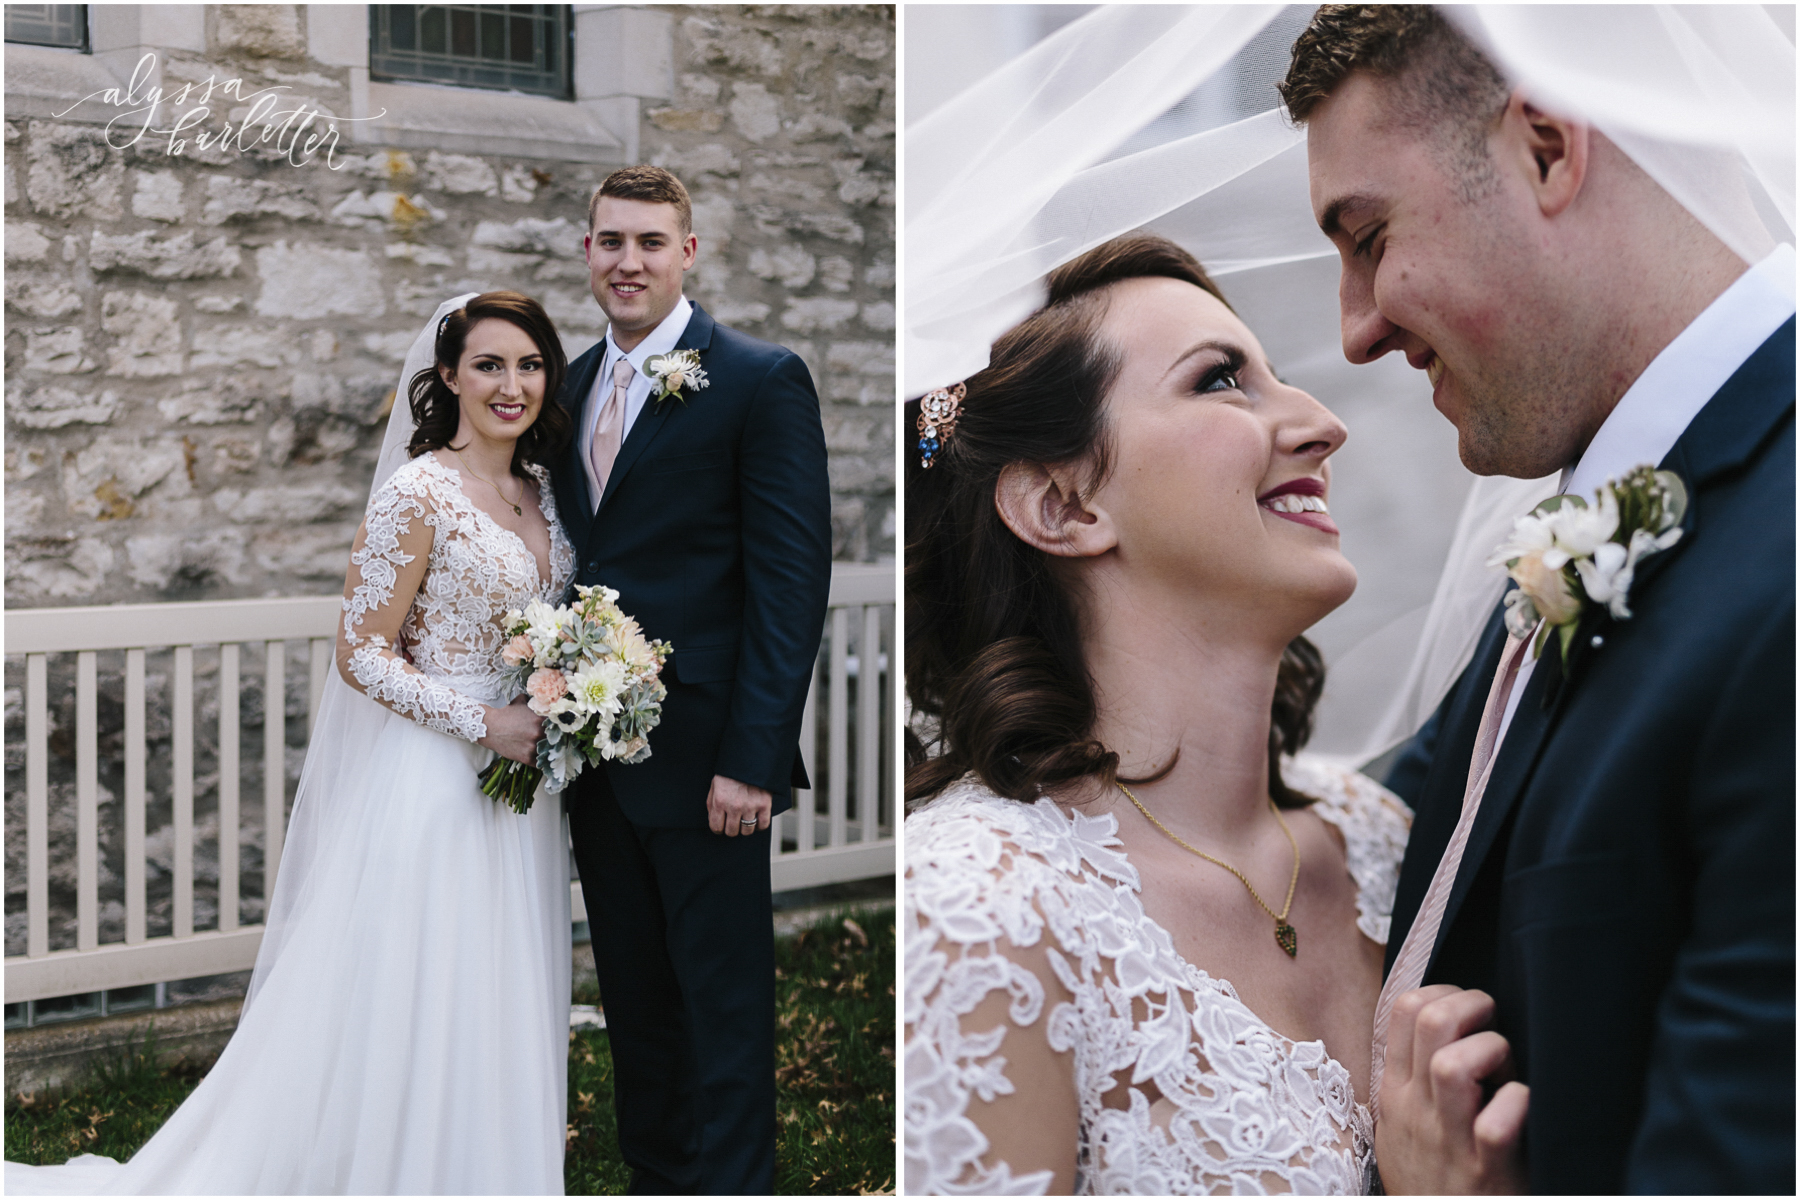 alyssa barletter wedding photography-900.jpg